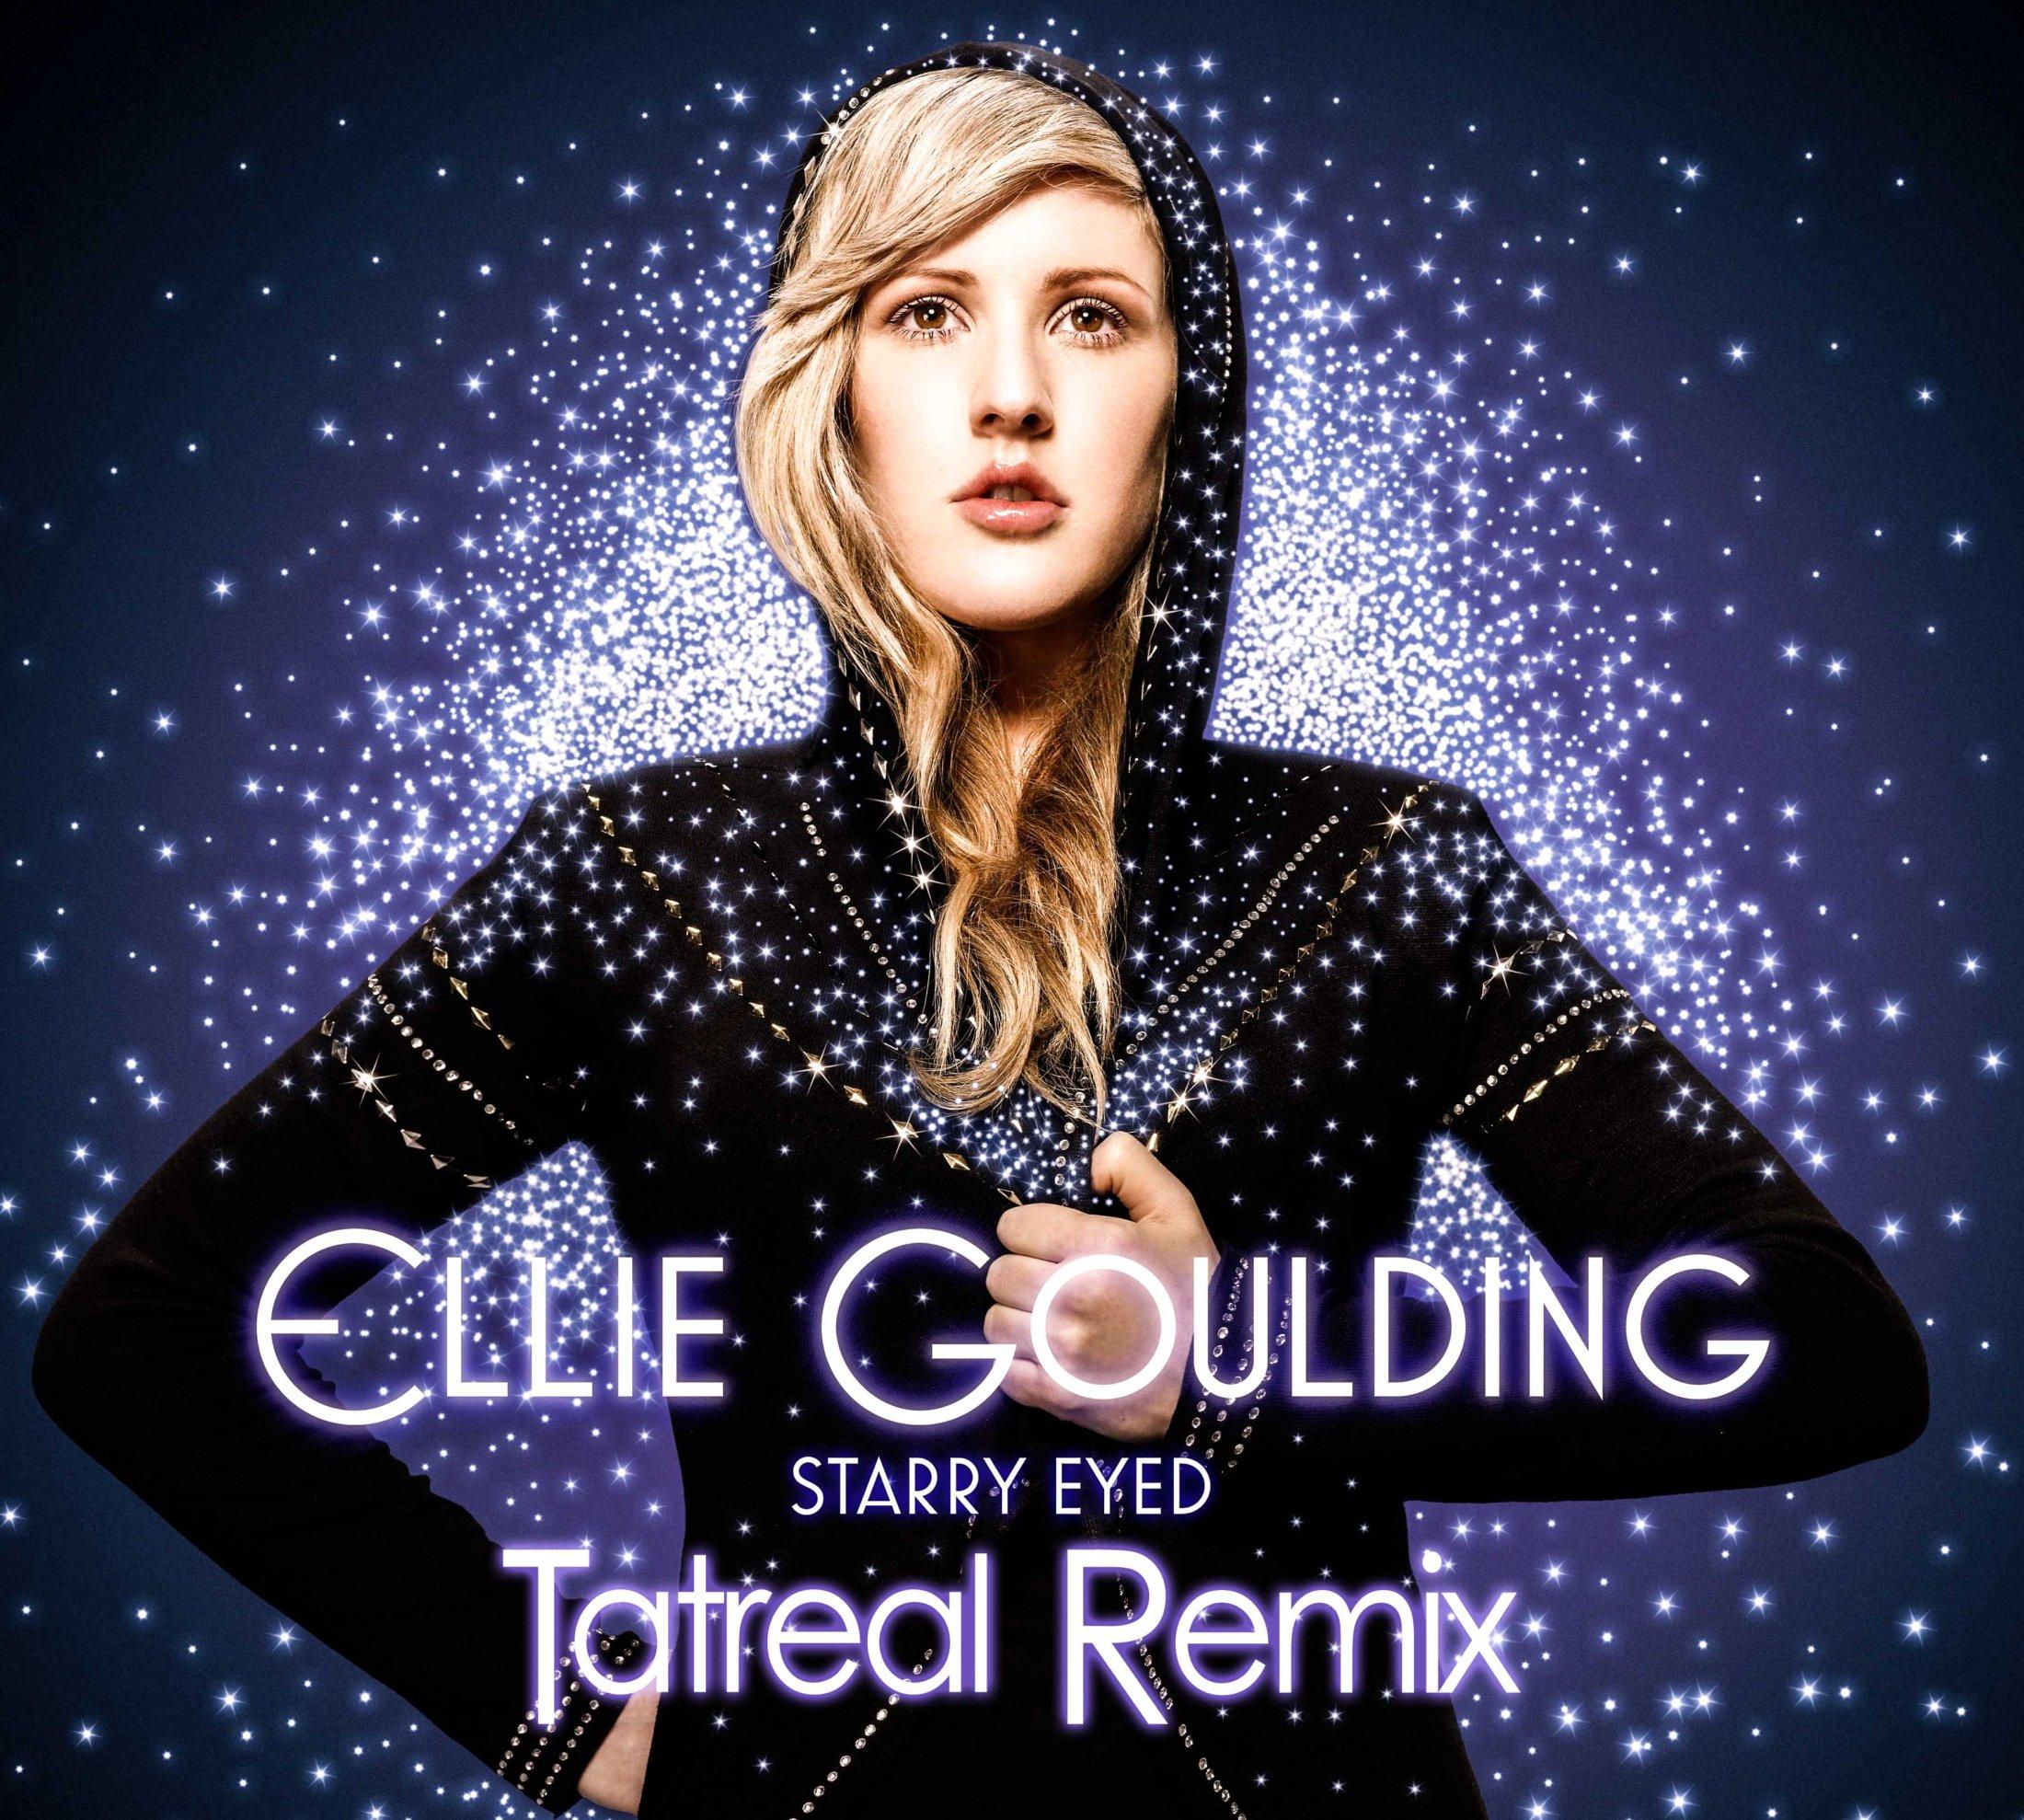 Ellie-Goulding-Starry-Eyed